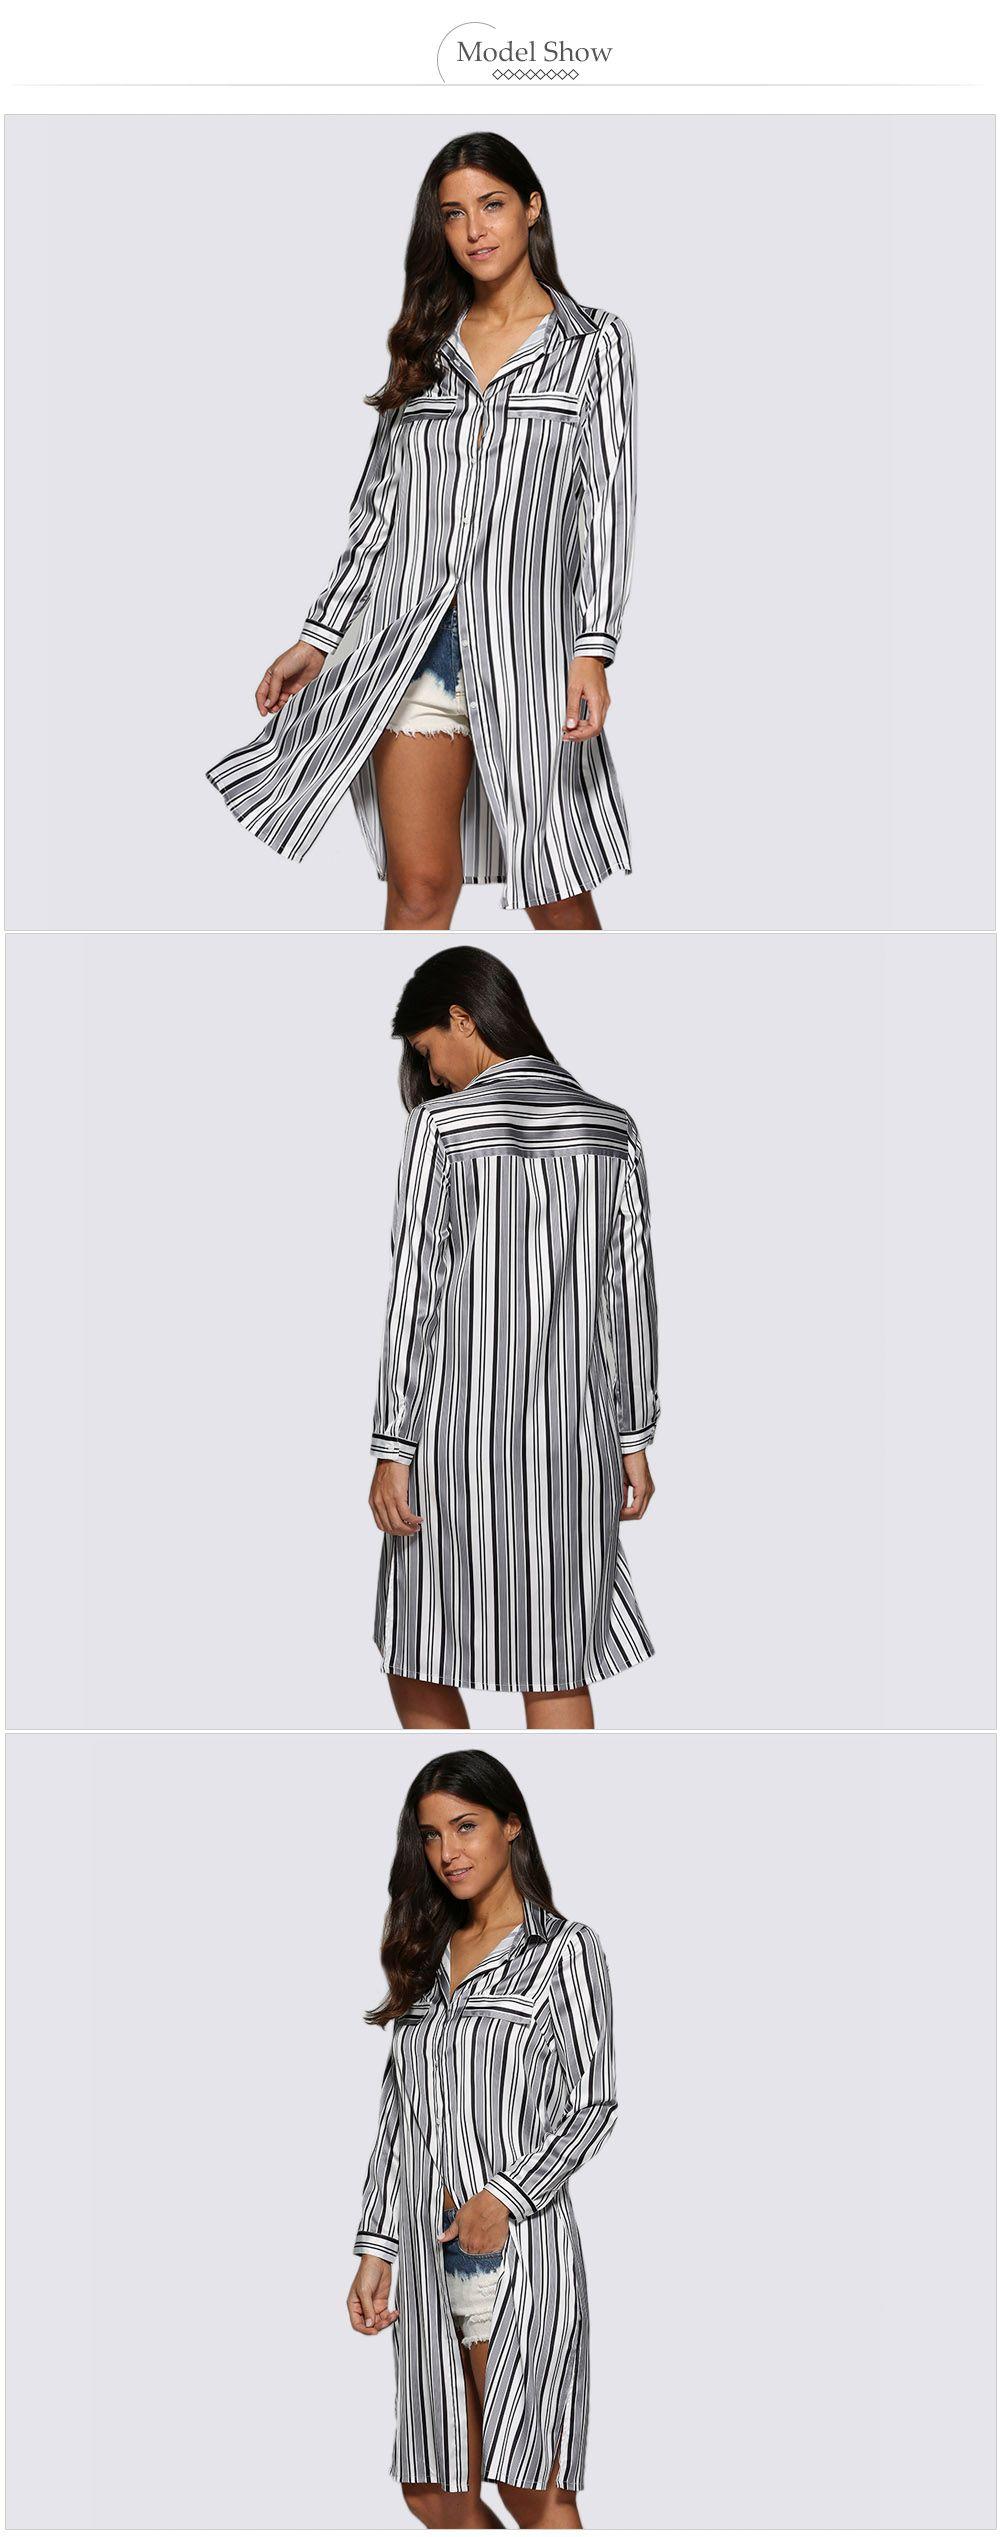 Street Style Turn Down Collar Allover Striped Button Design Women Blouse